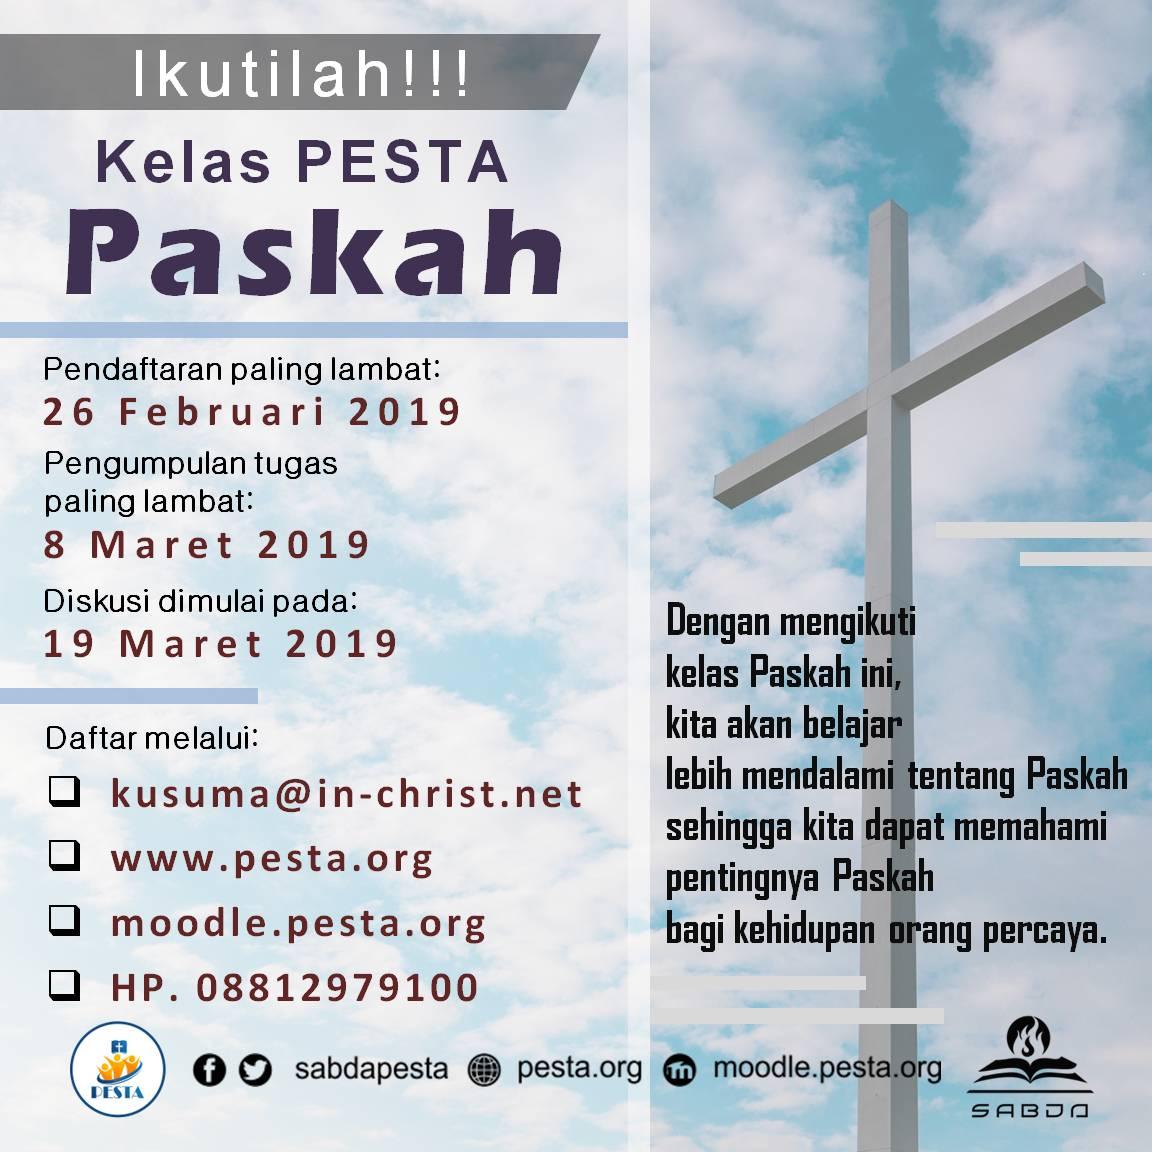 Kelas PESTA Paskah Maret-April 2019